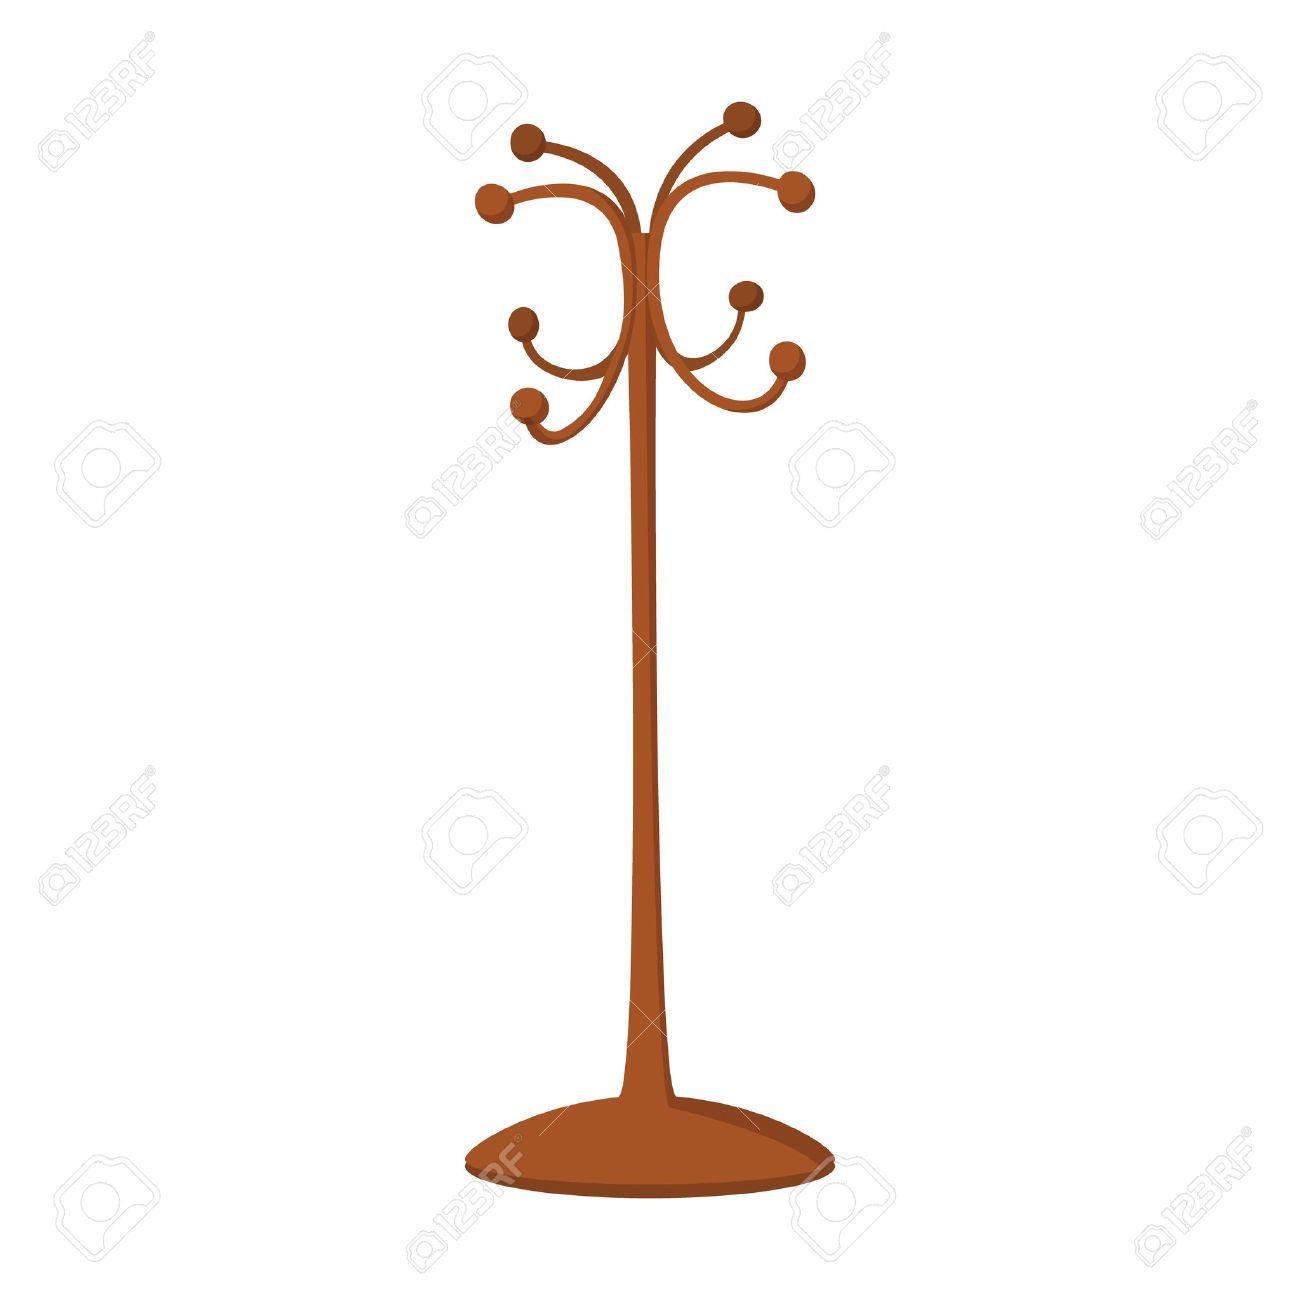 Wooden coat rack cartoon icon on a white background royalty free wooden coat rack cartoon icon on a white background stock vector 51175911 buycottarizona